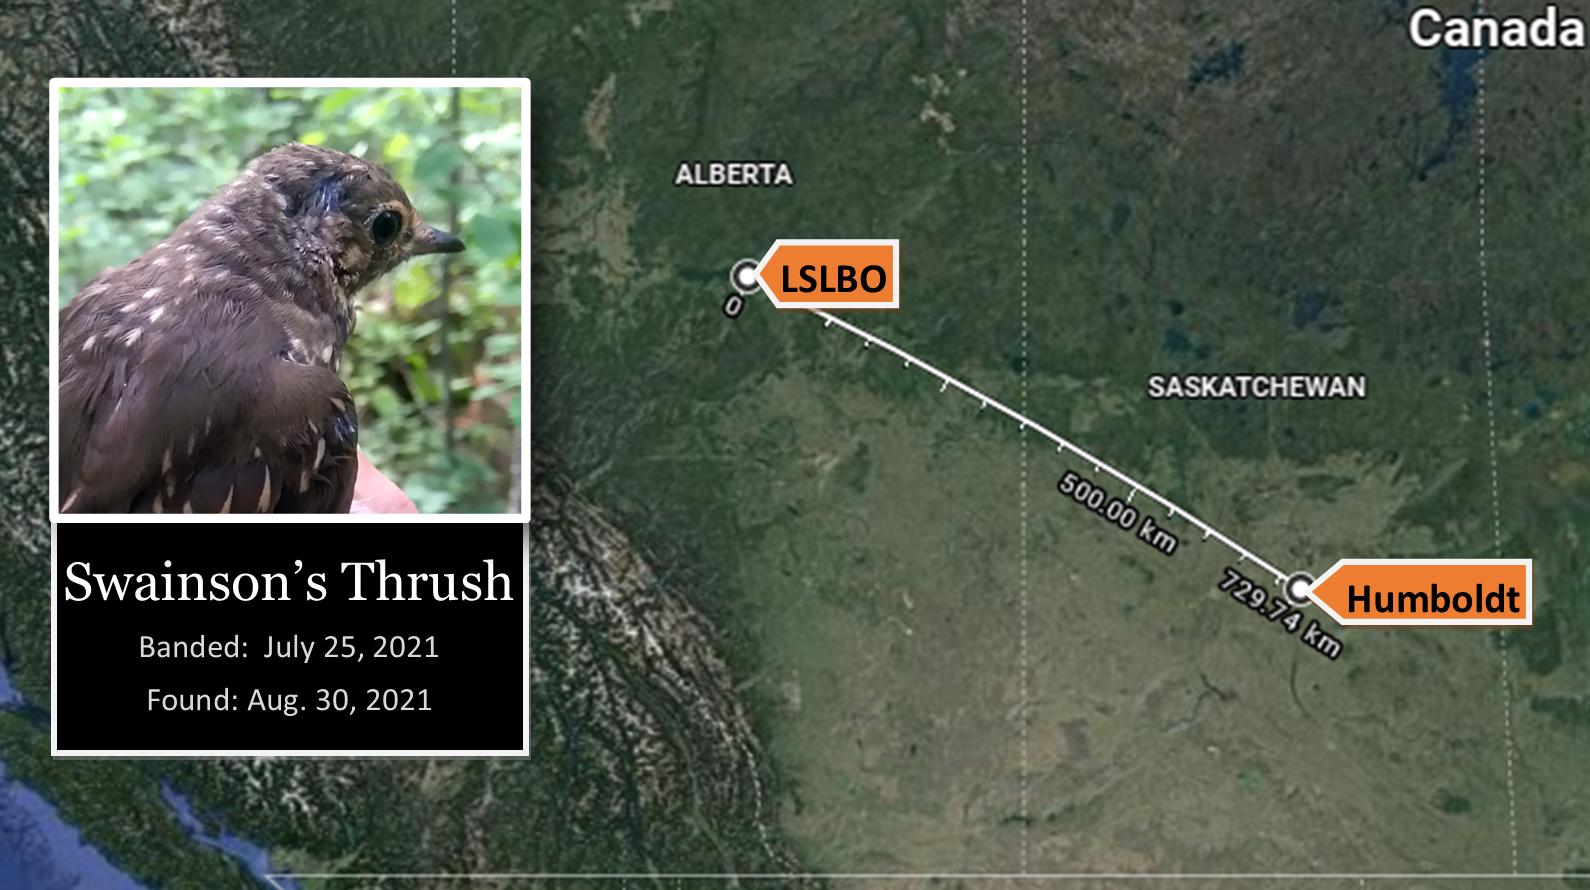 Map of Swainson's Thrush recovery in Humboldt, Saskatchewan